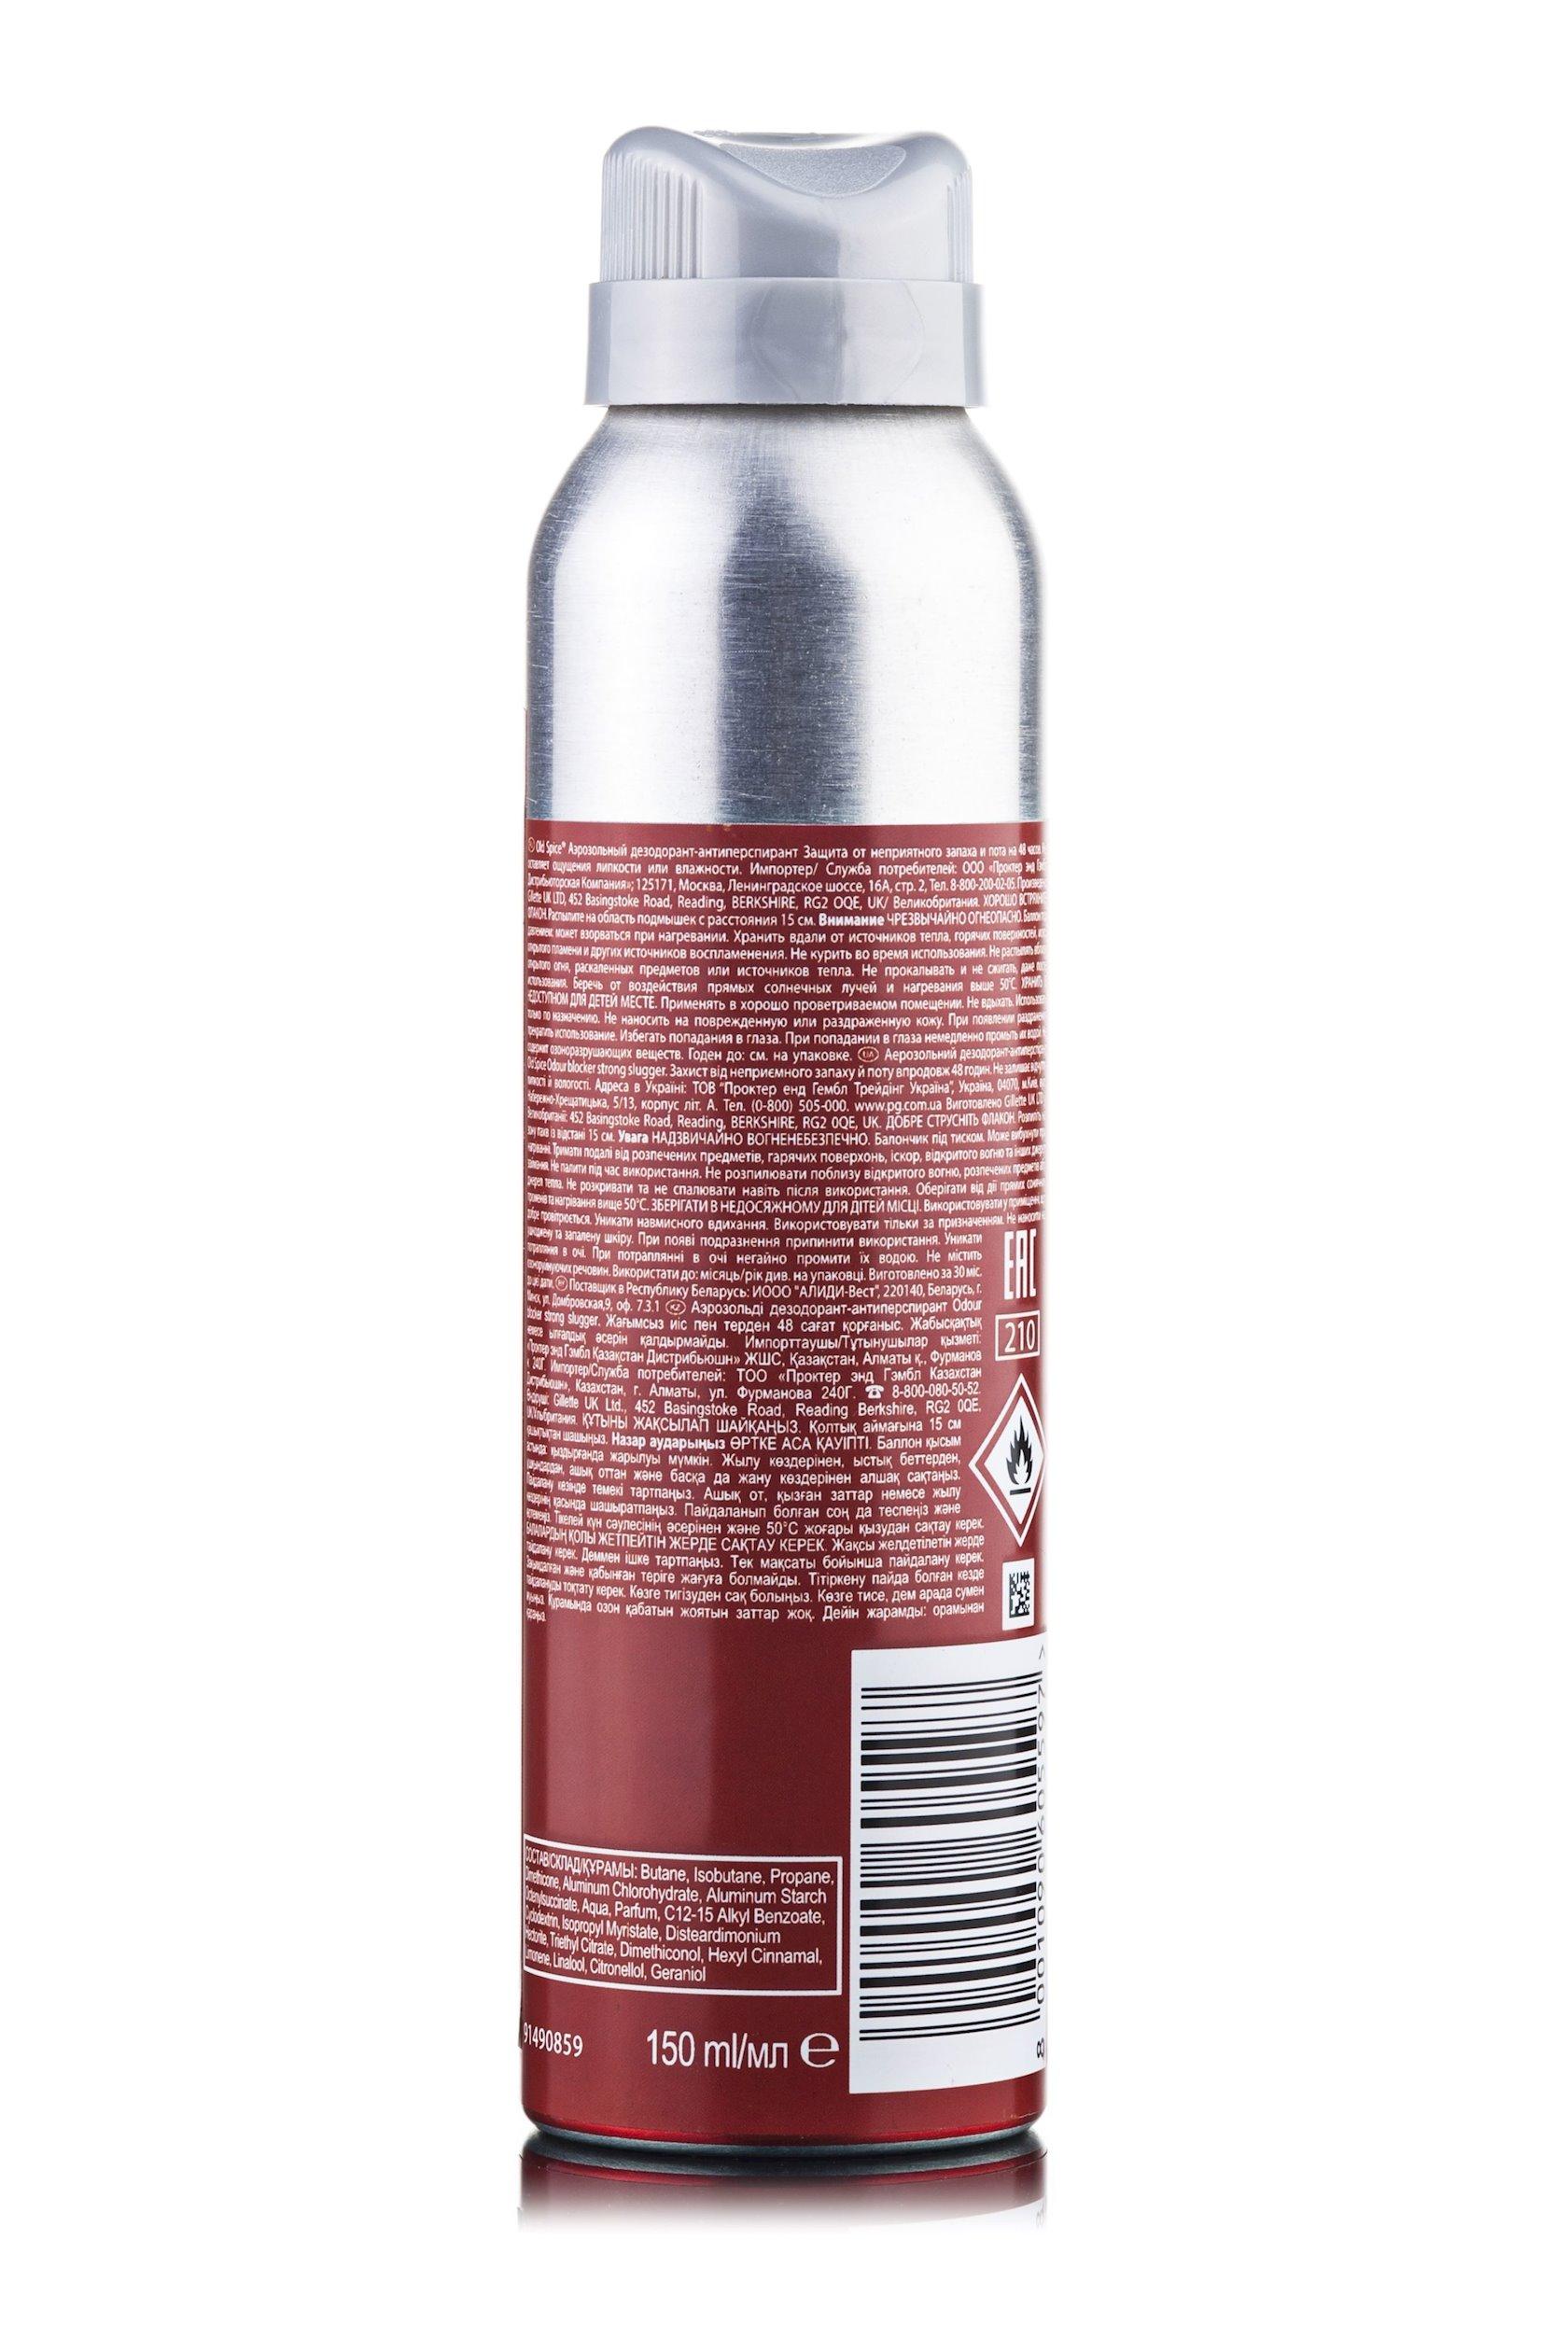 Dezodorant-antiperspirant Old Spice Odour Blocker Strong Slugger, 150 ml